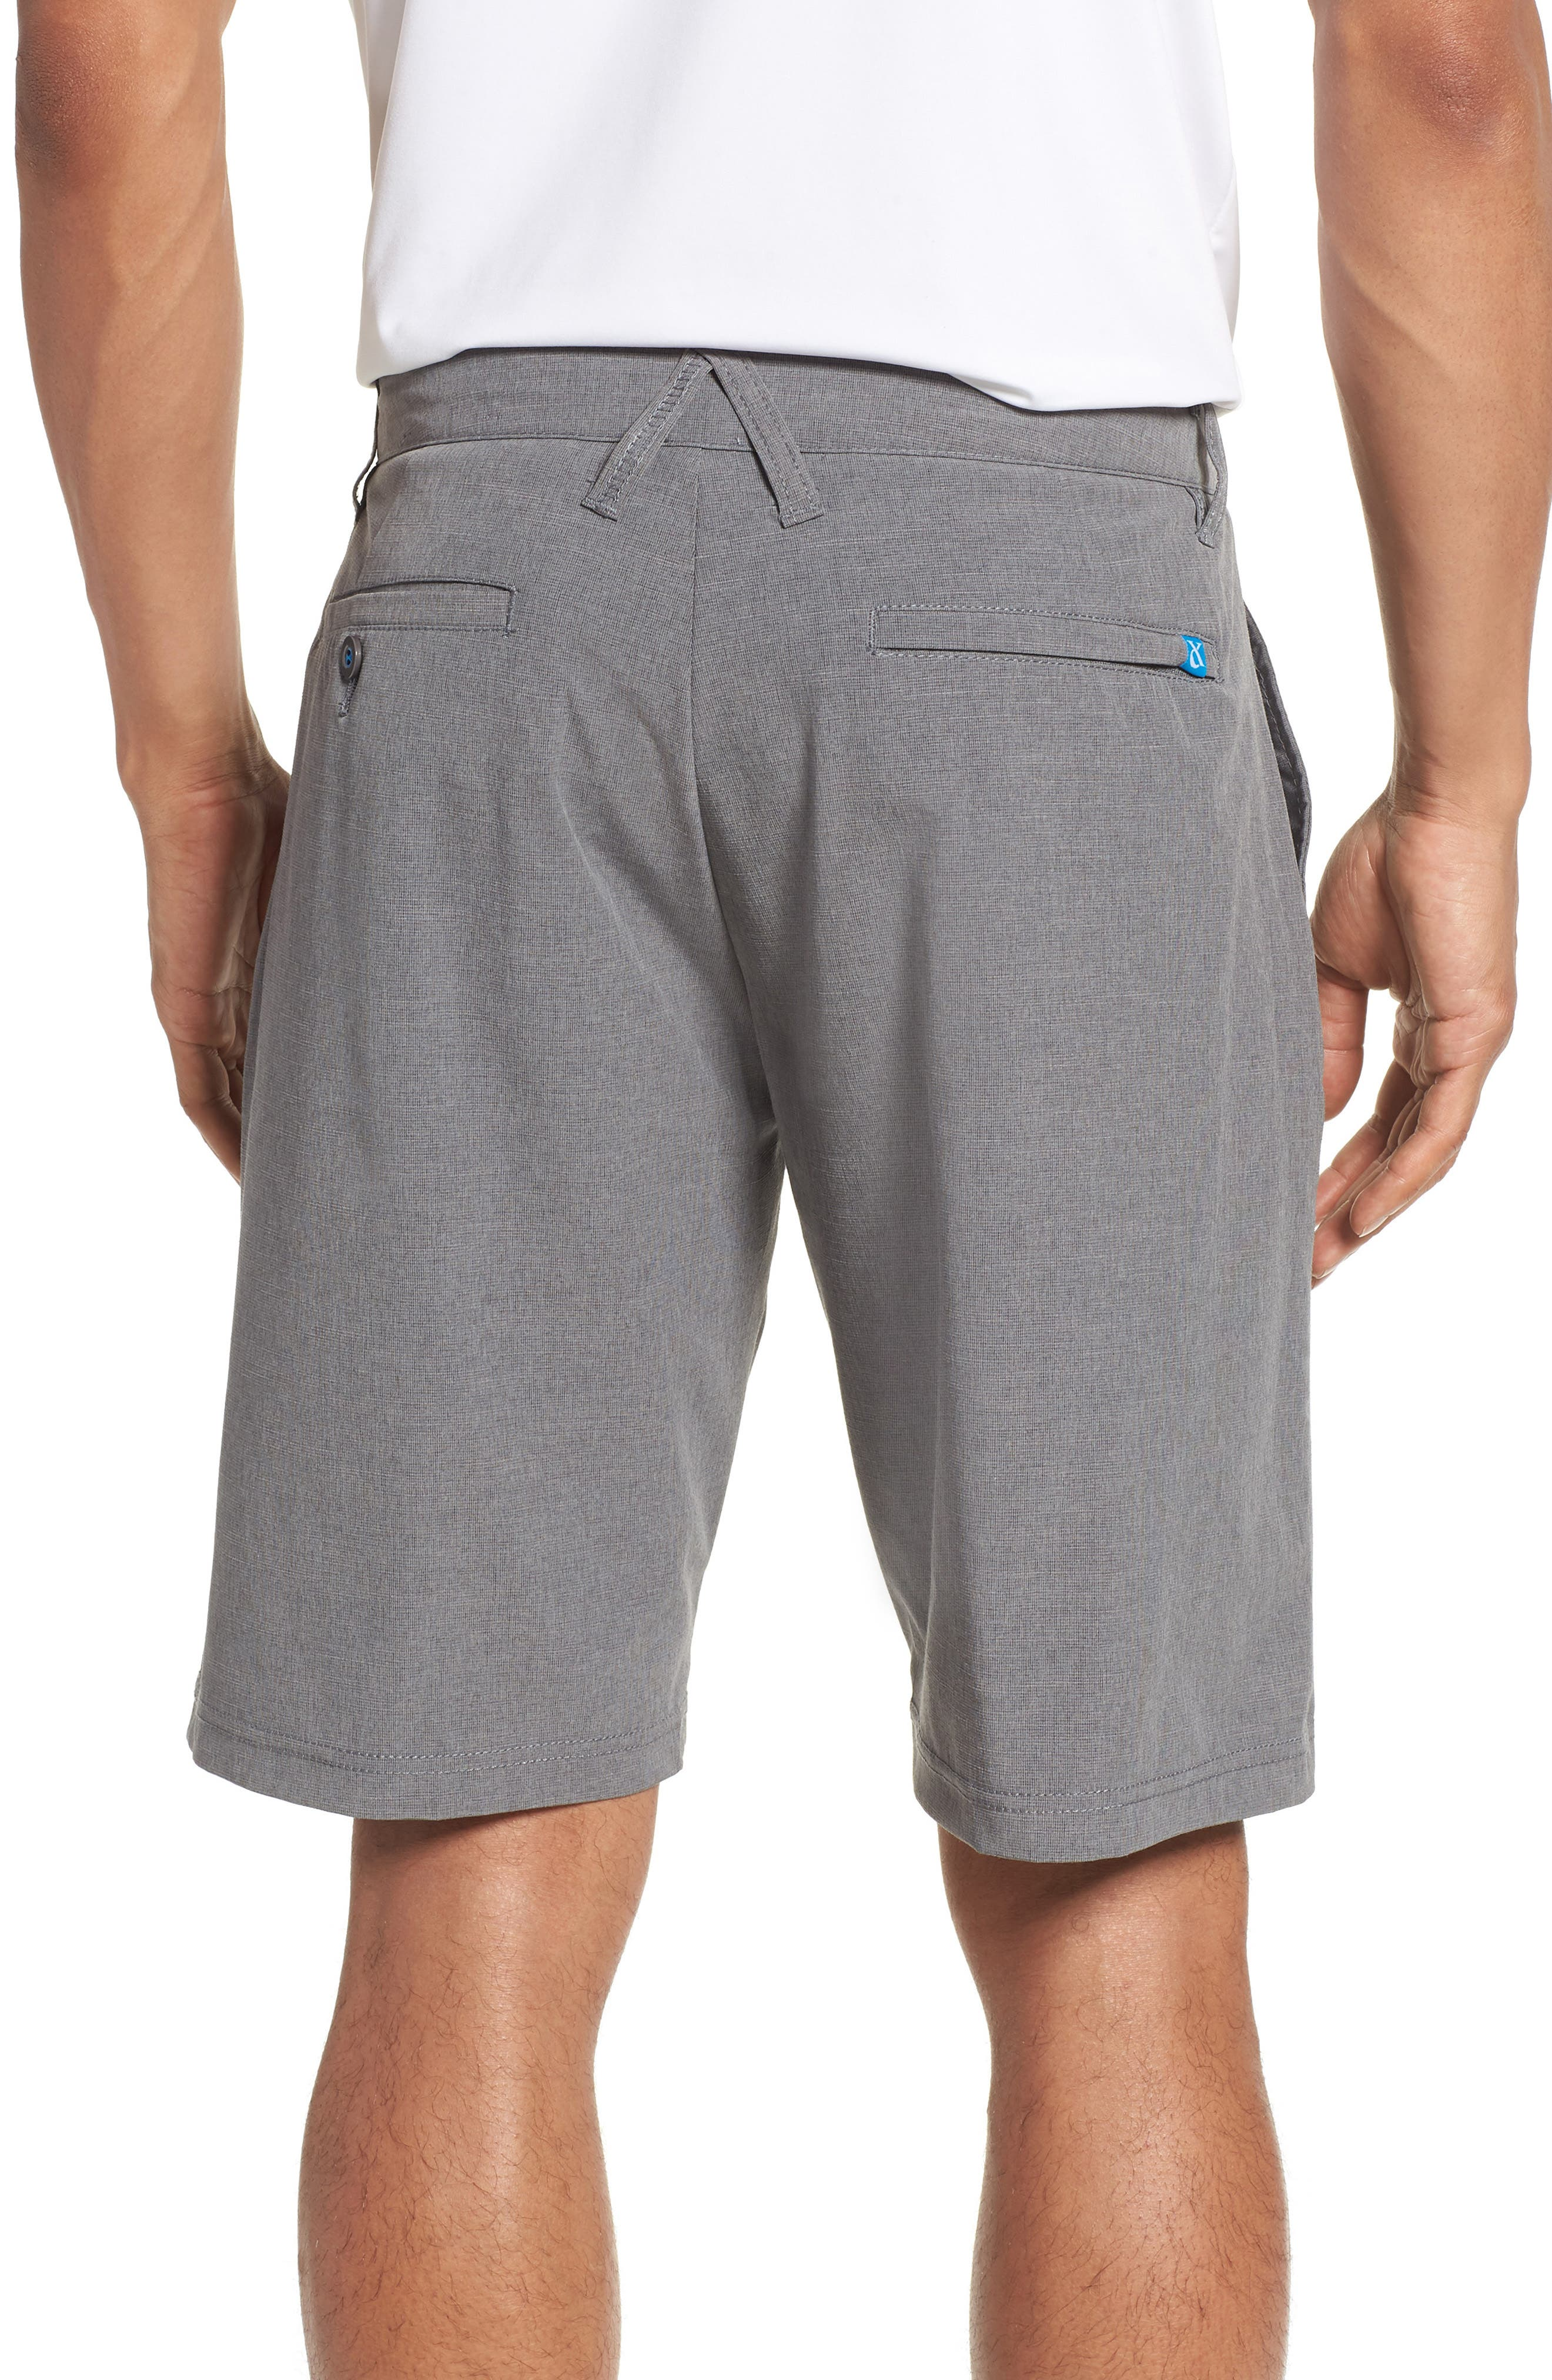 DEVEREUX, Cruiser Hybrid Shorts, Alternate thumbnail 2, color, CHARCOAL